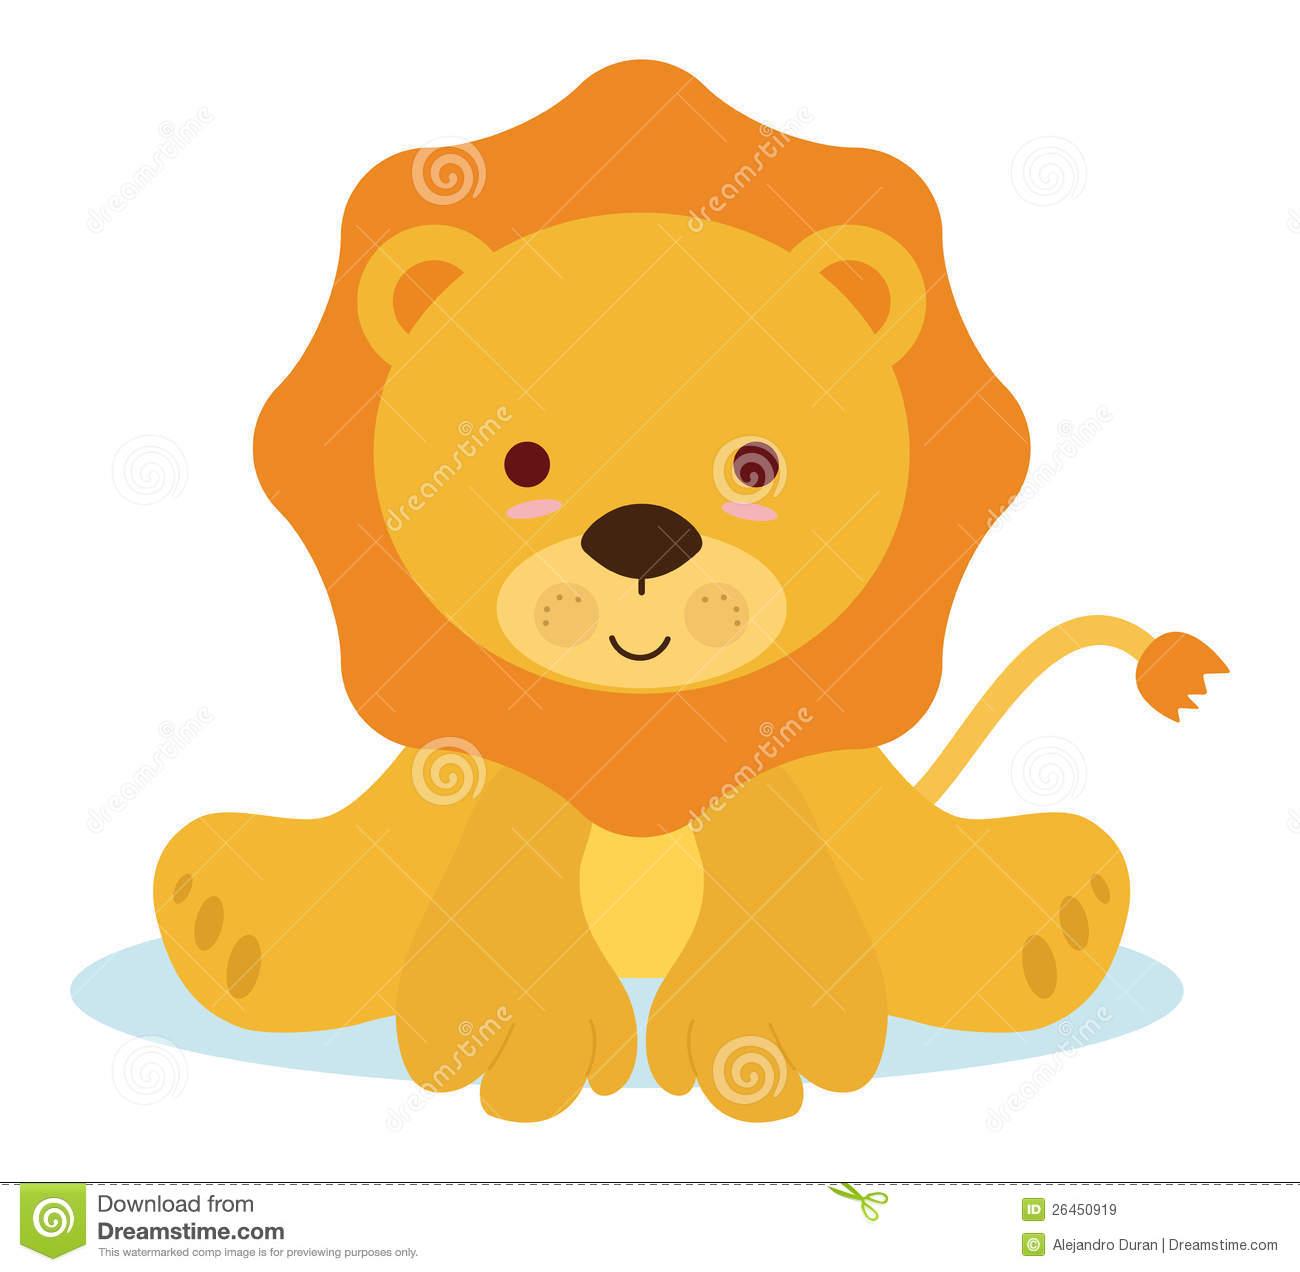 Cute Roaring Lion Clipart-cute roaring lion clipart-11